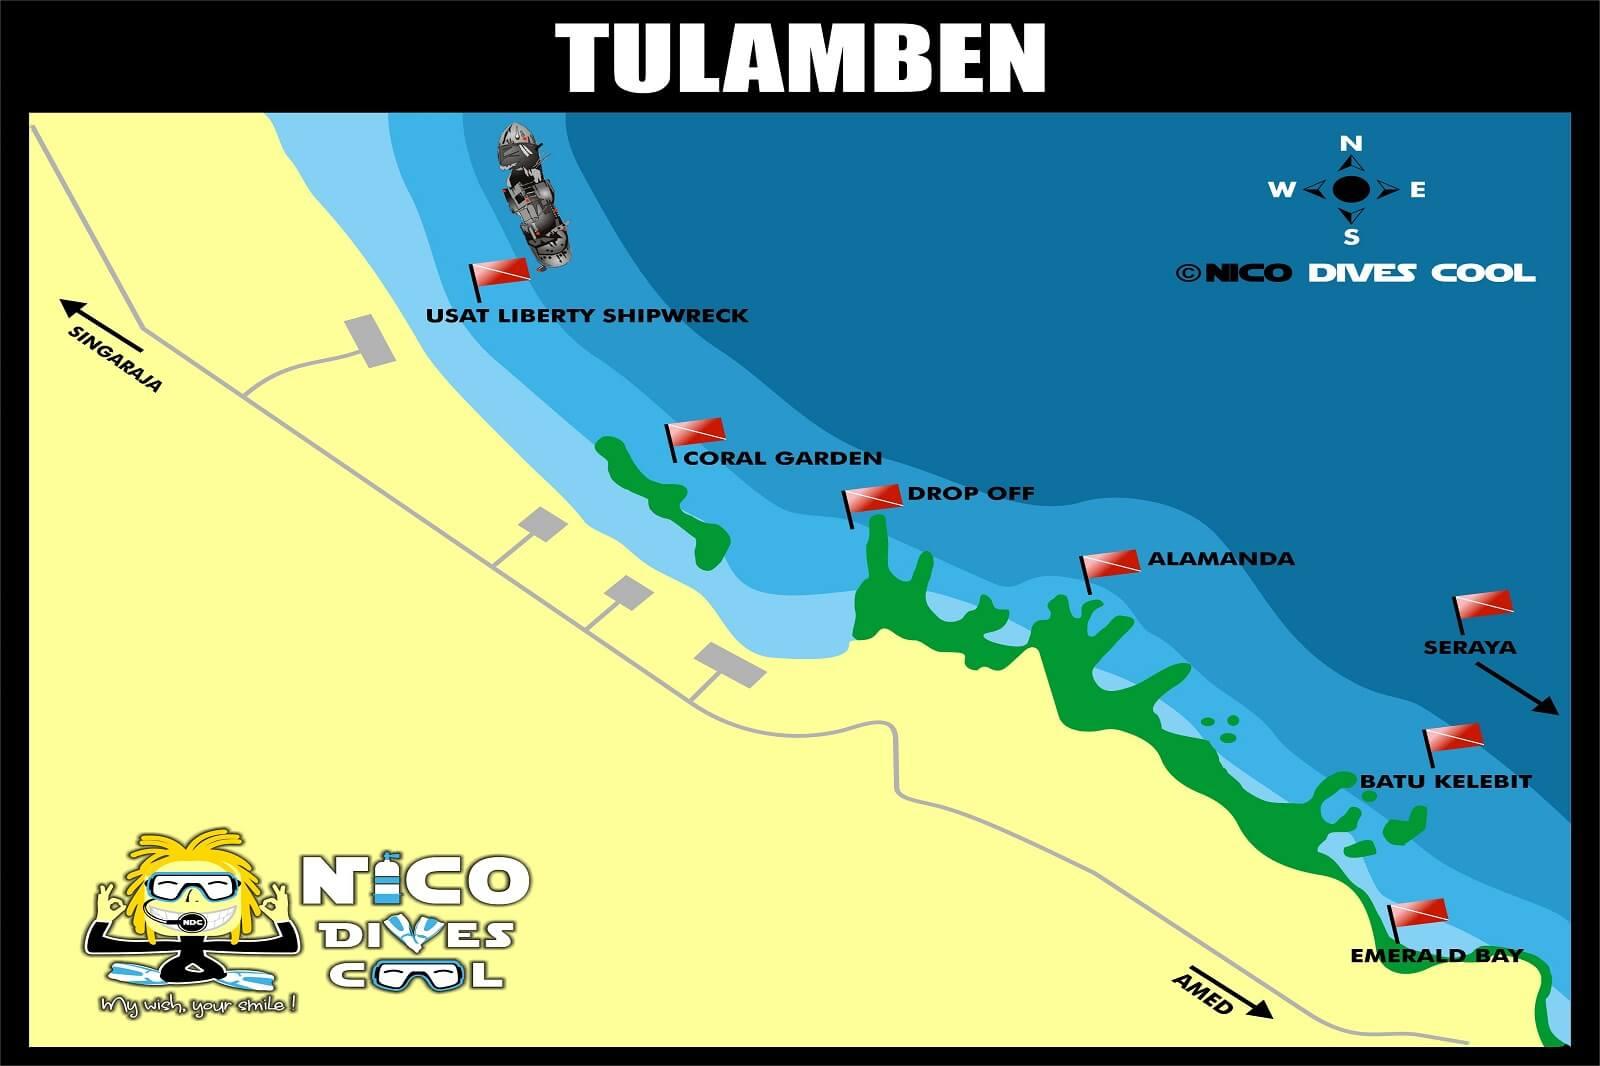 Carte des spots de plongée de Tulamben